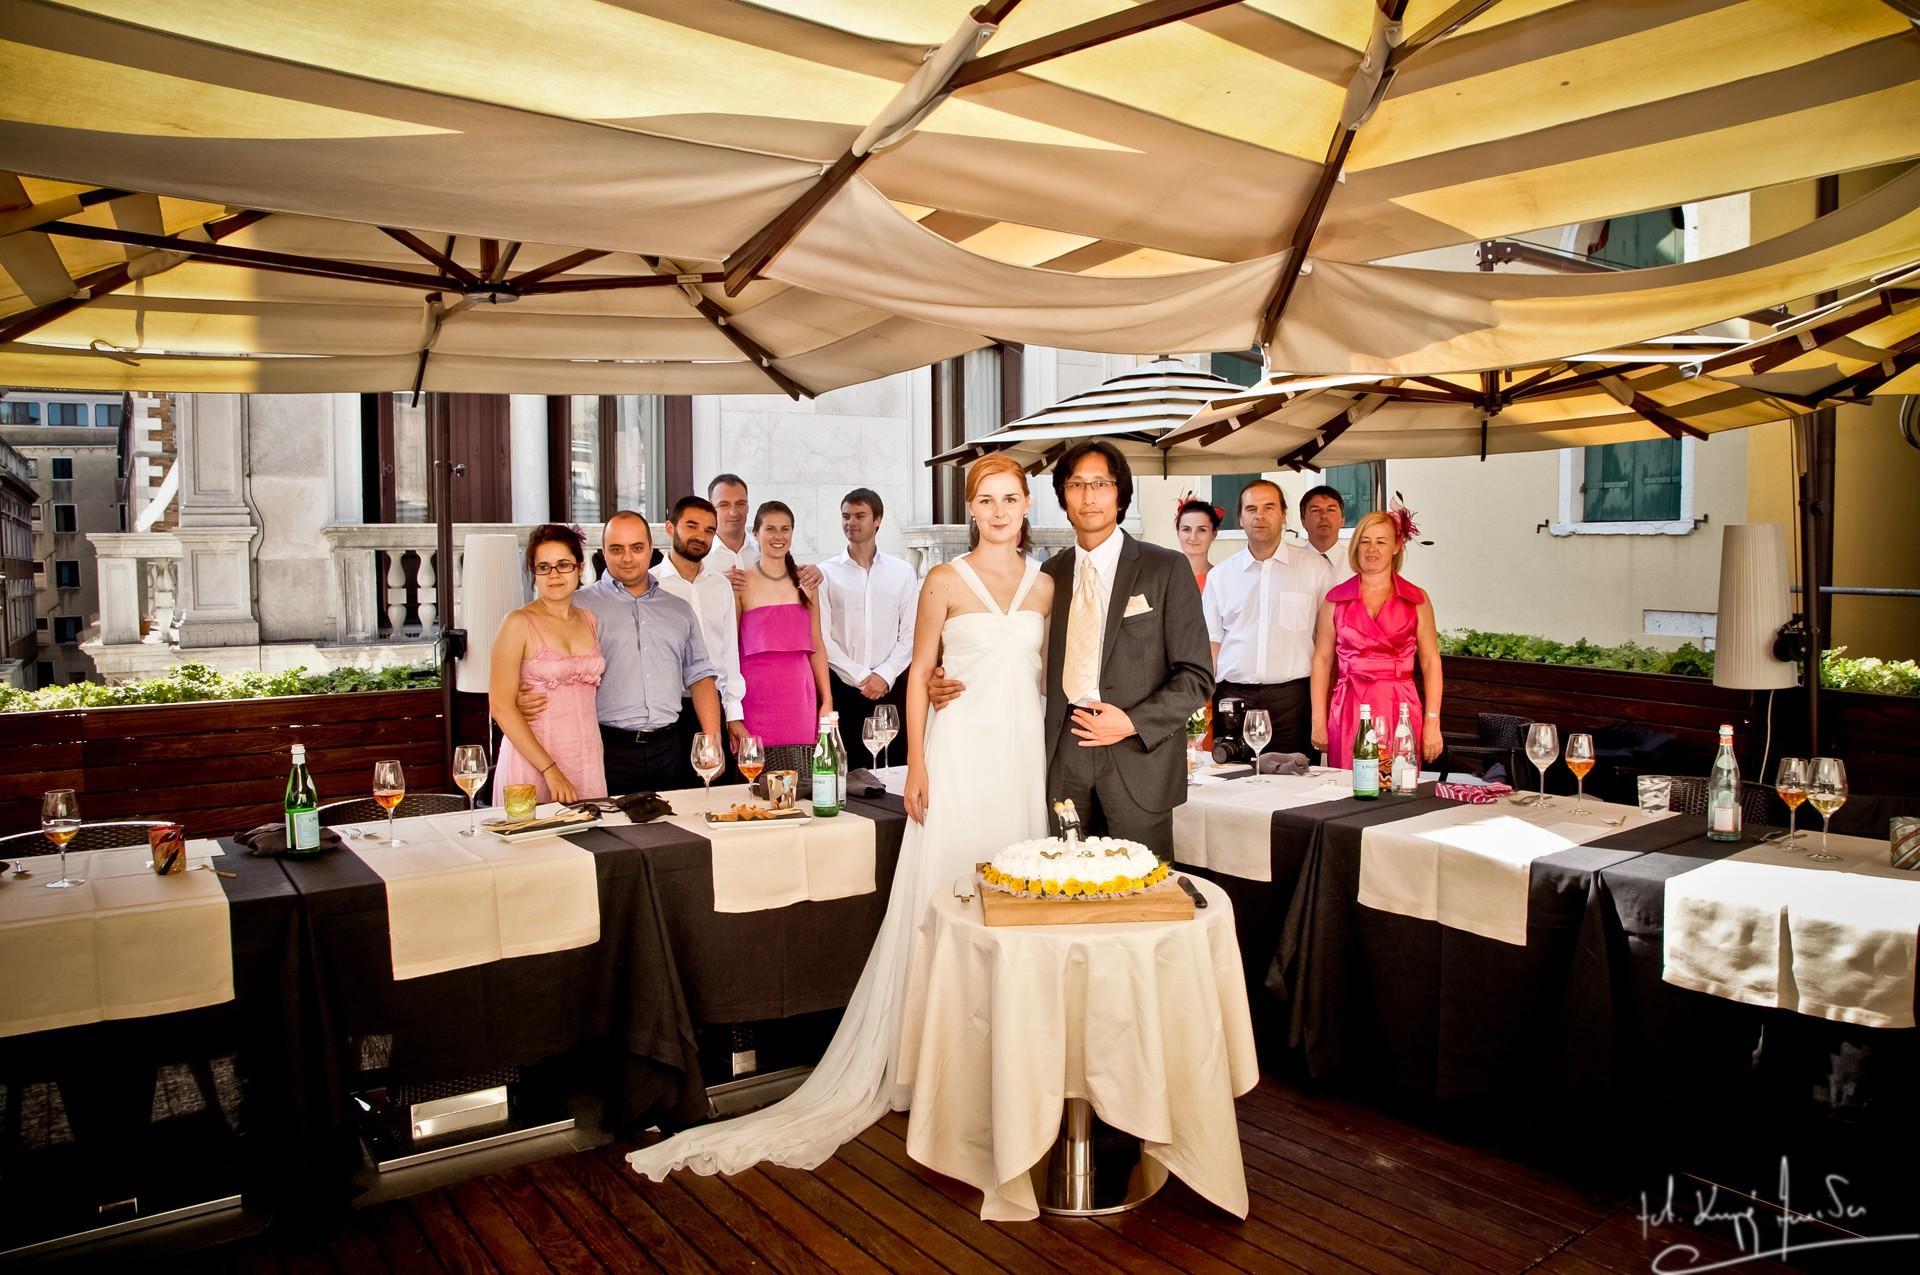 Ślub w wenecji 68 Manuela Luiza & Young Seon Song